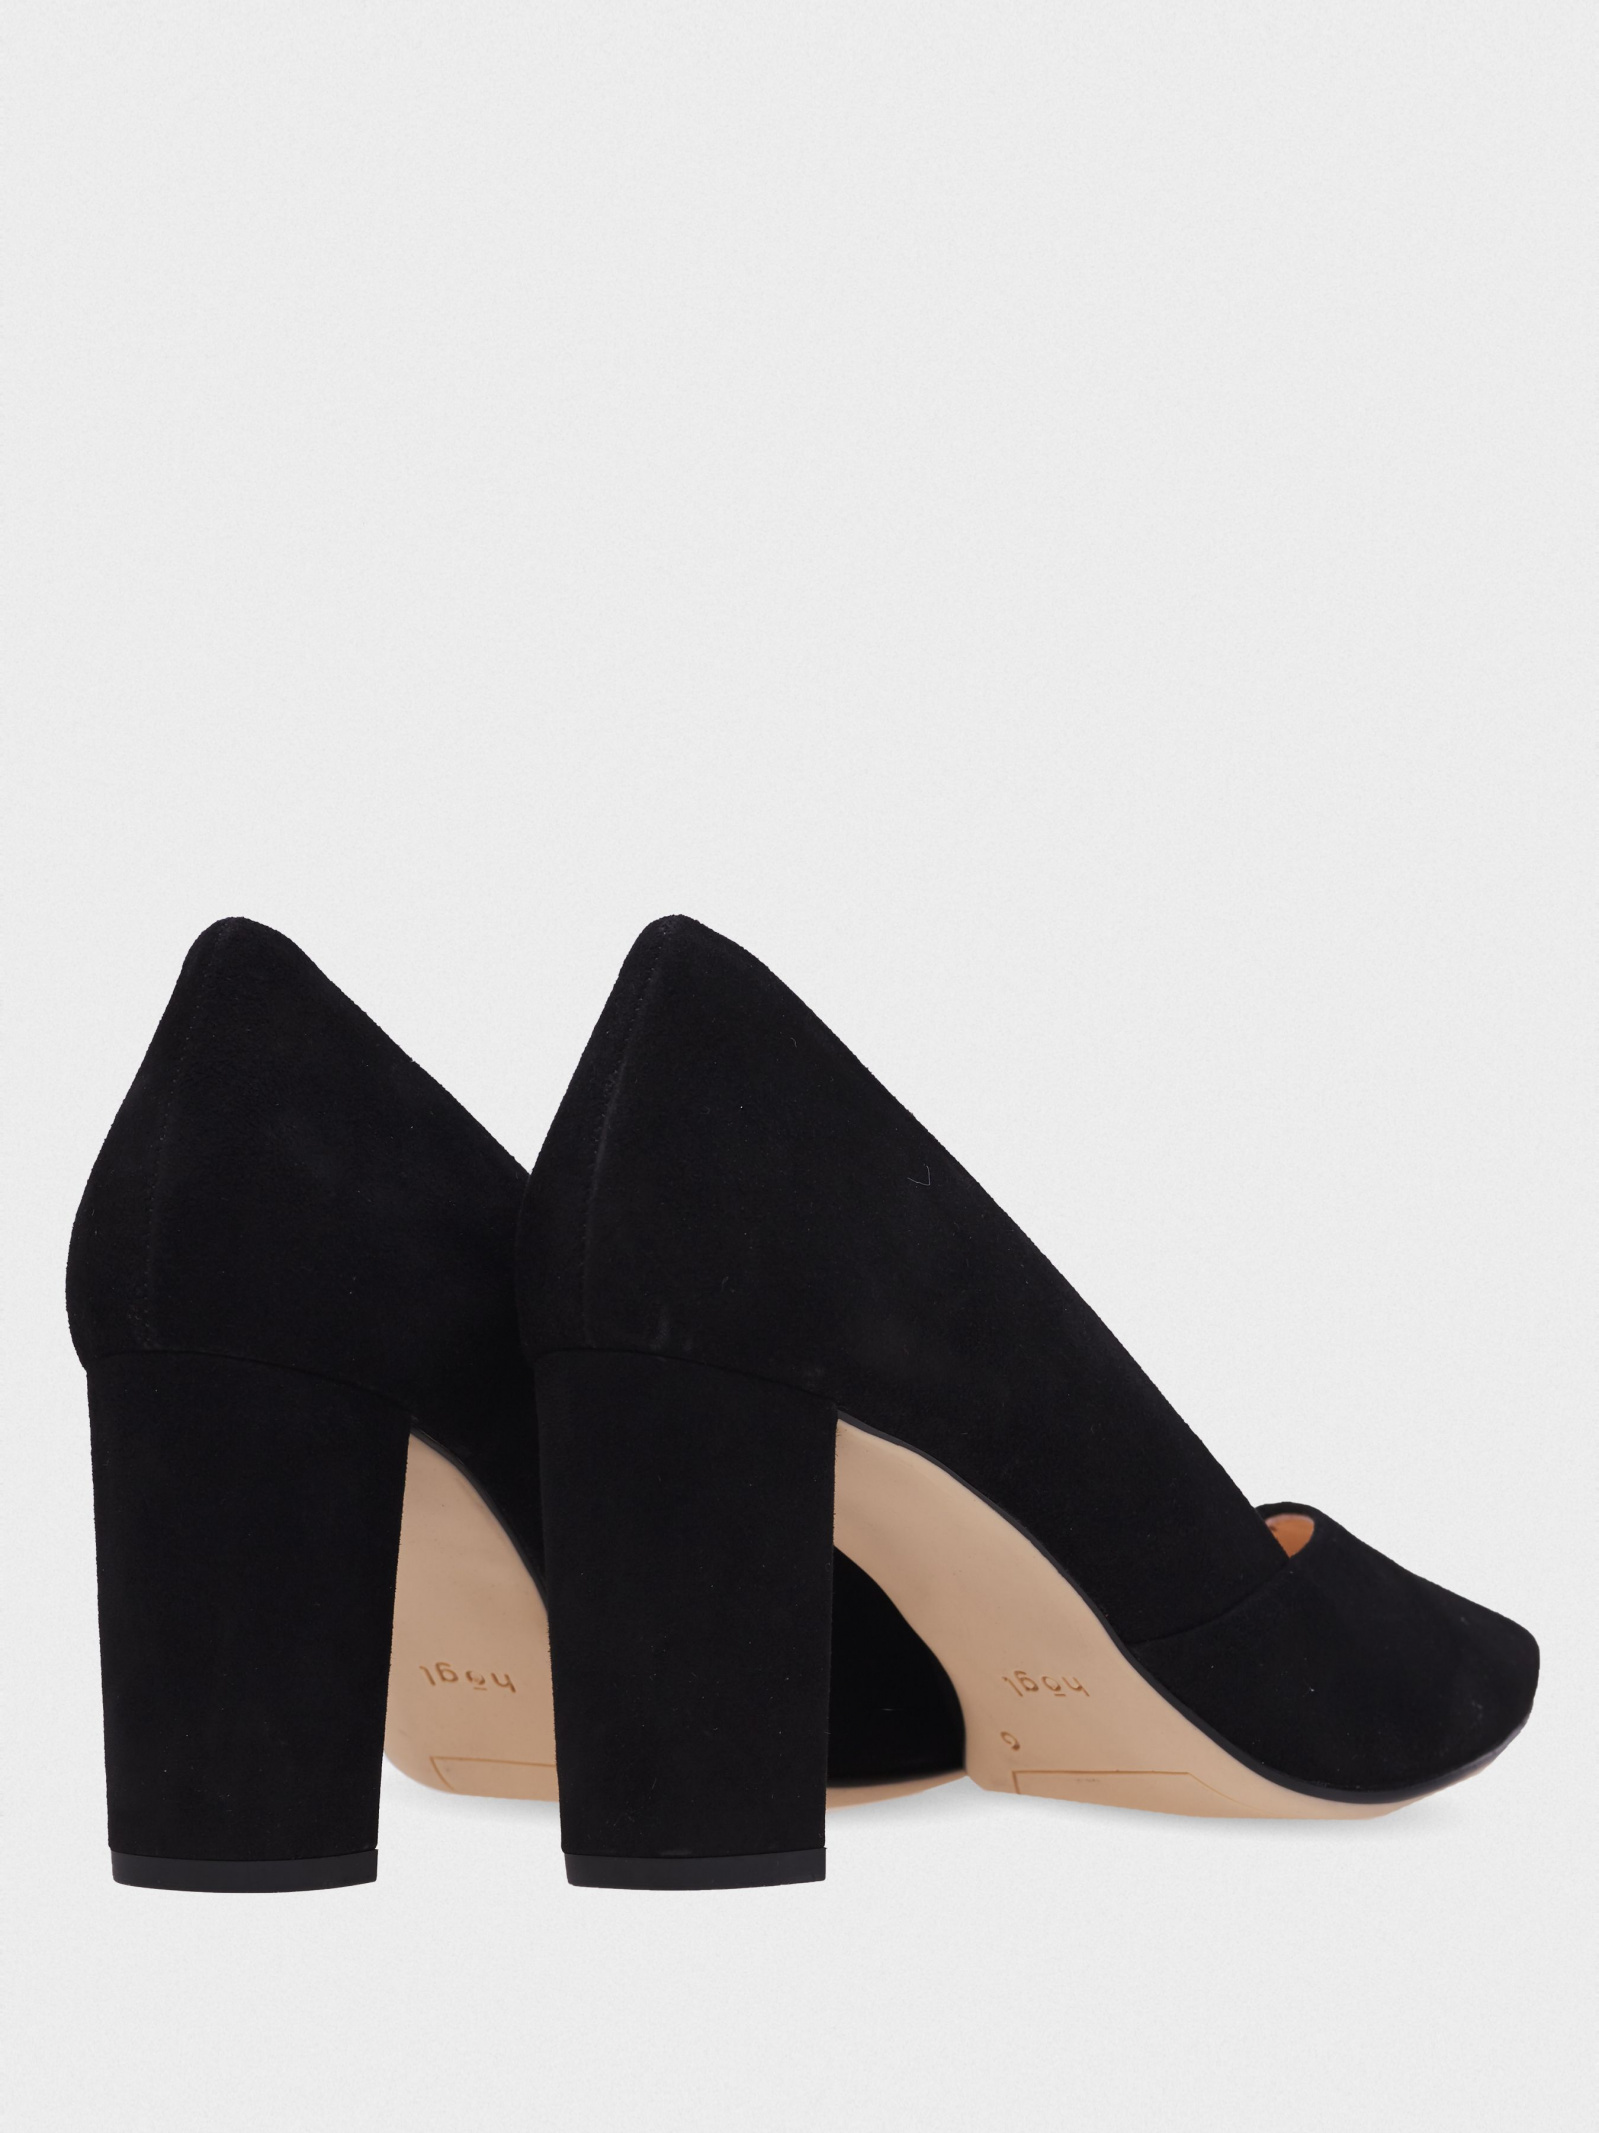 Туфли для женщин Hogl YN4025 цена, 2017